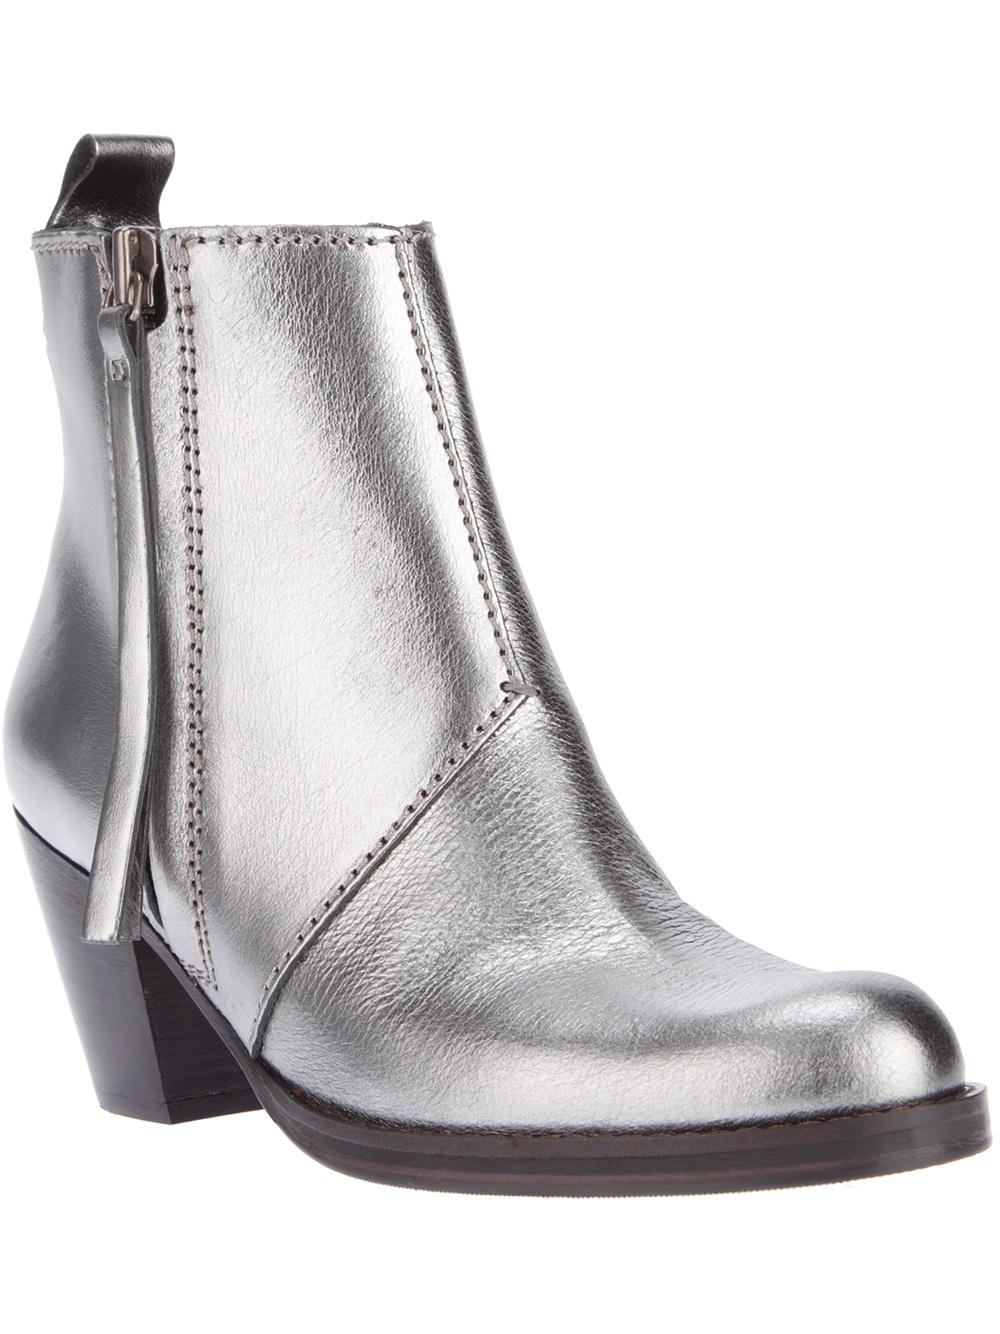 Acne studios Pistol Short Ankle Boot in Metallic | Lyst